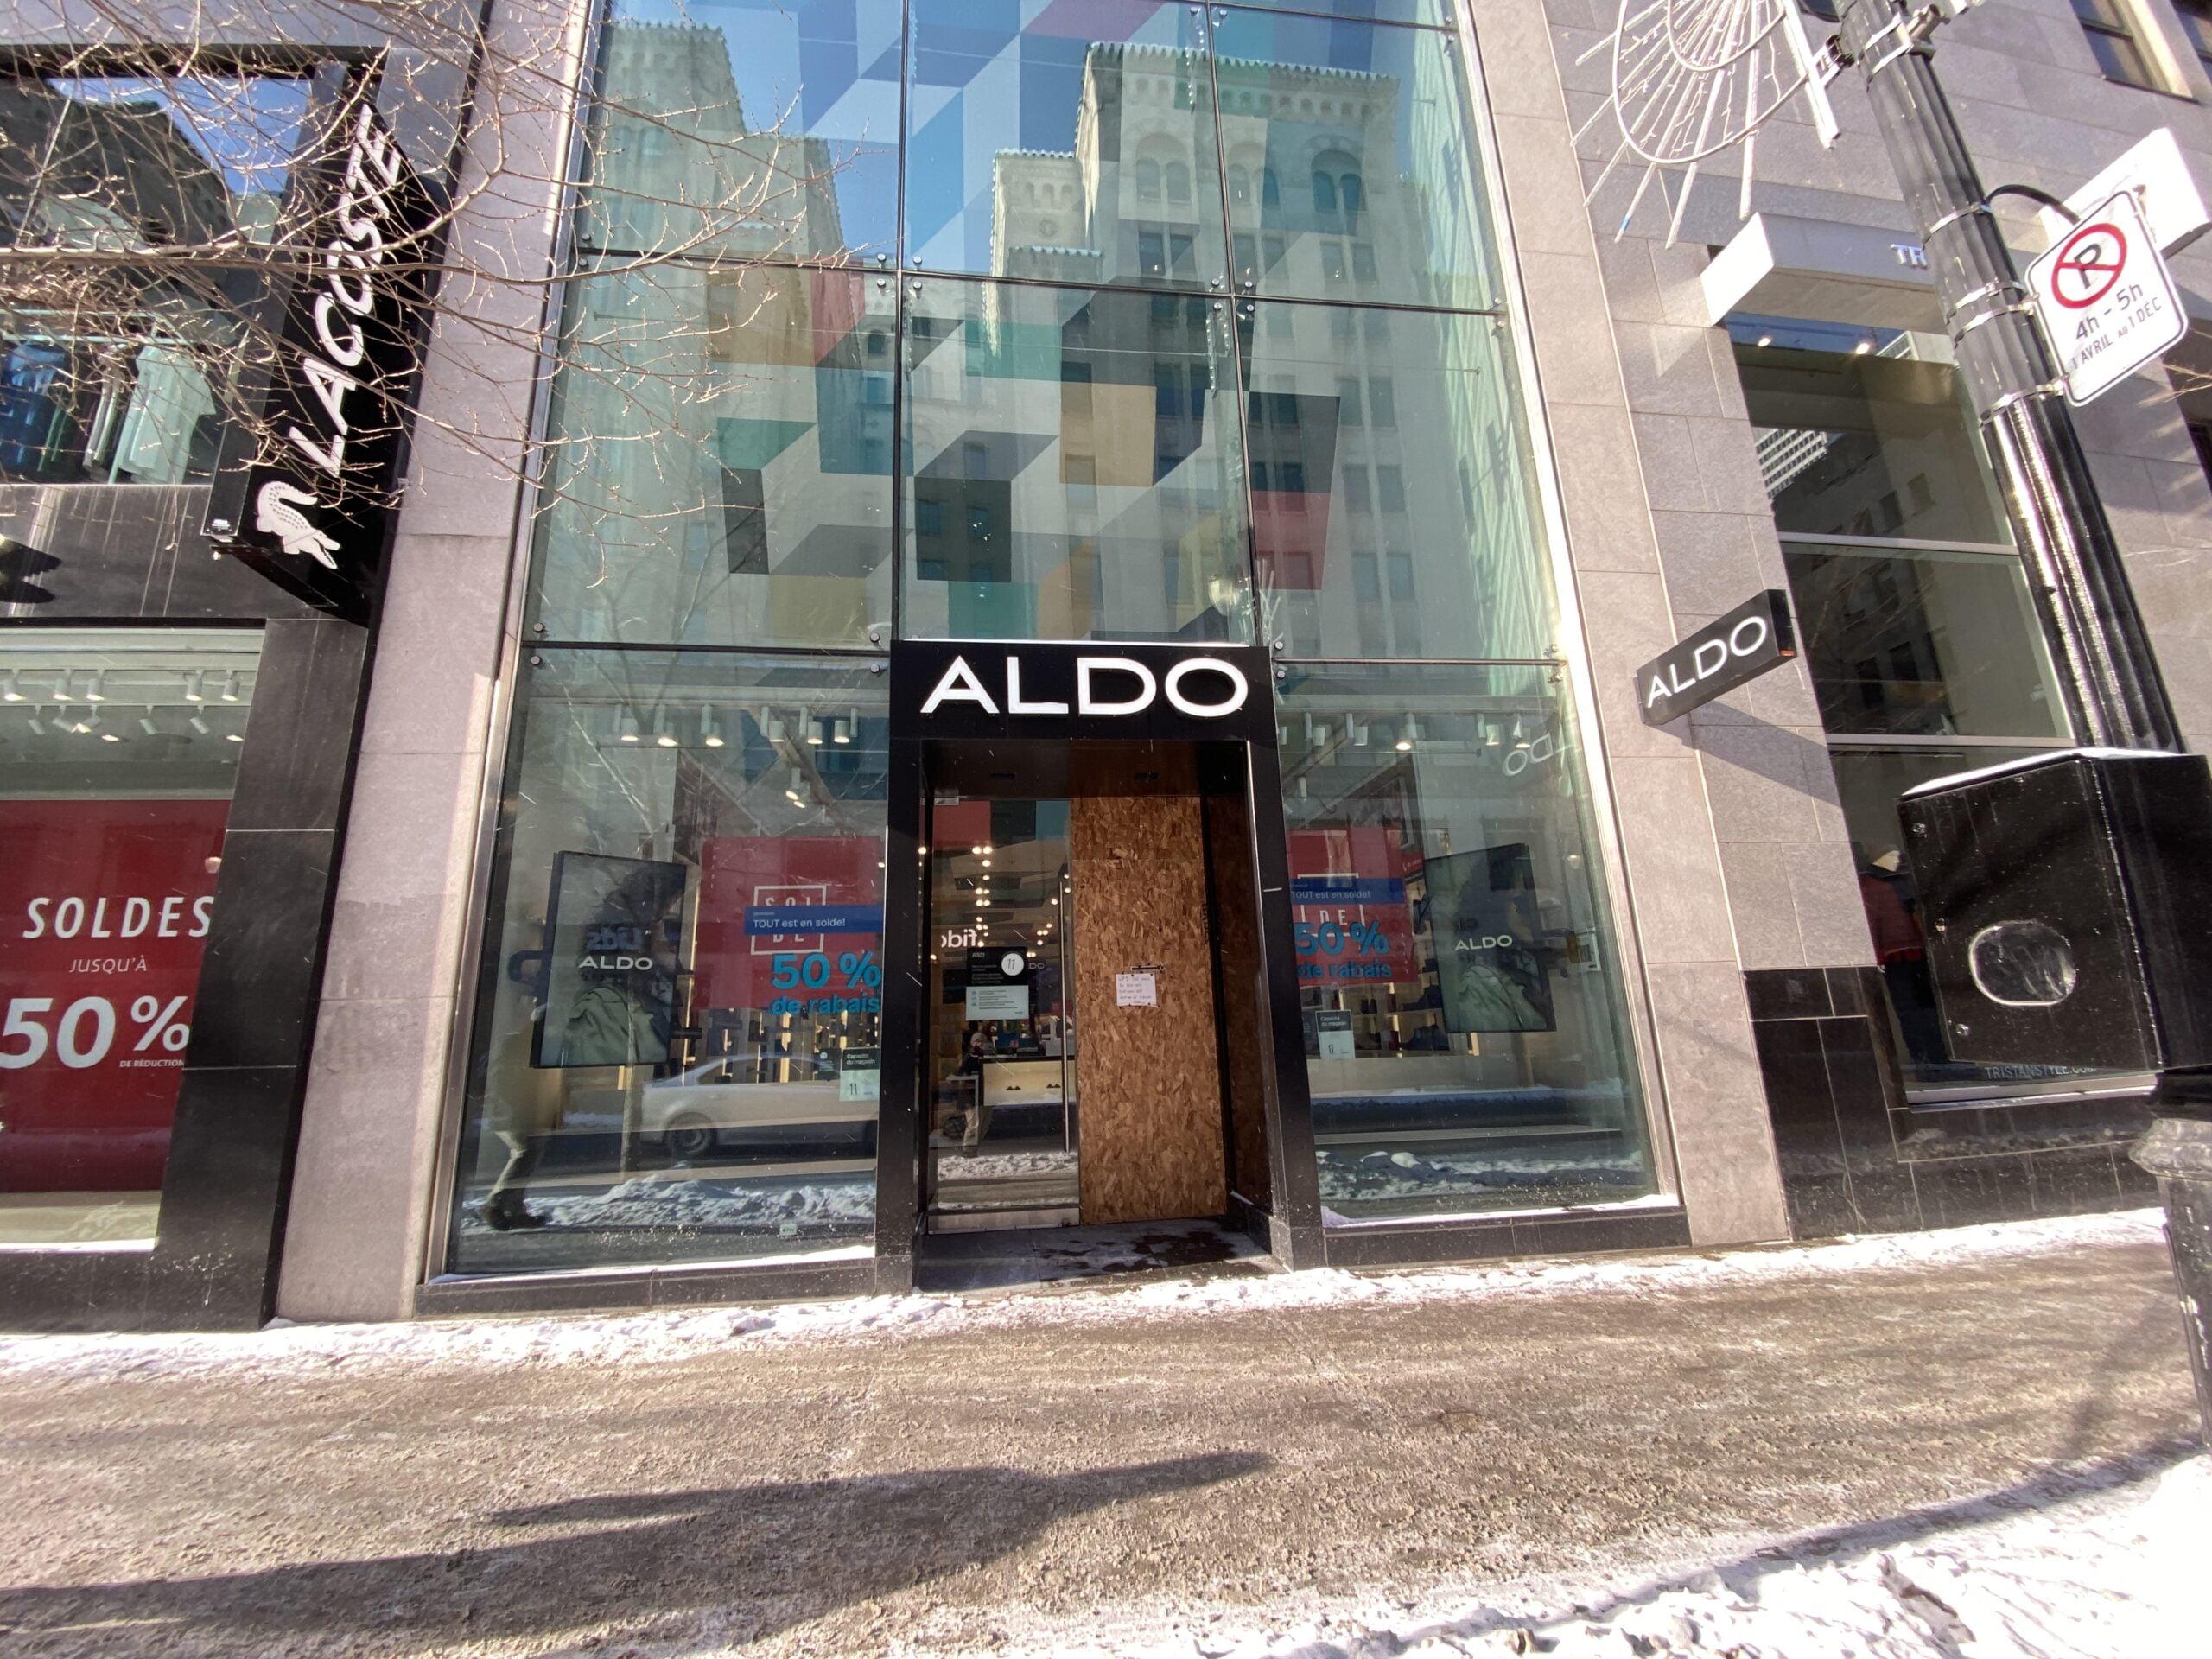 Aldo on Saint-Catherine St W